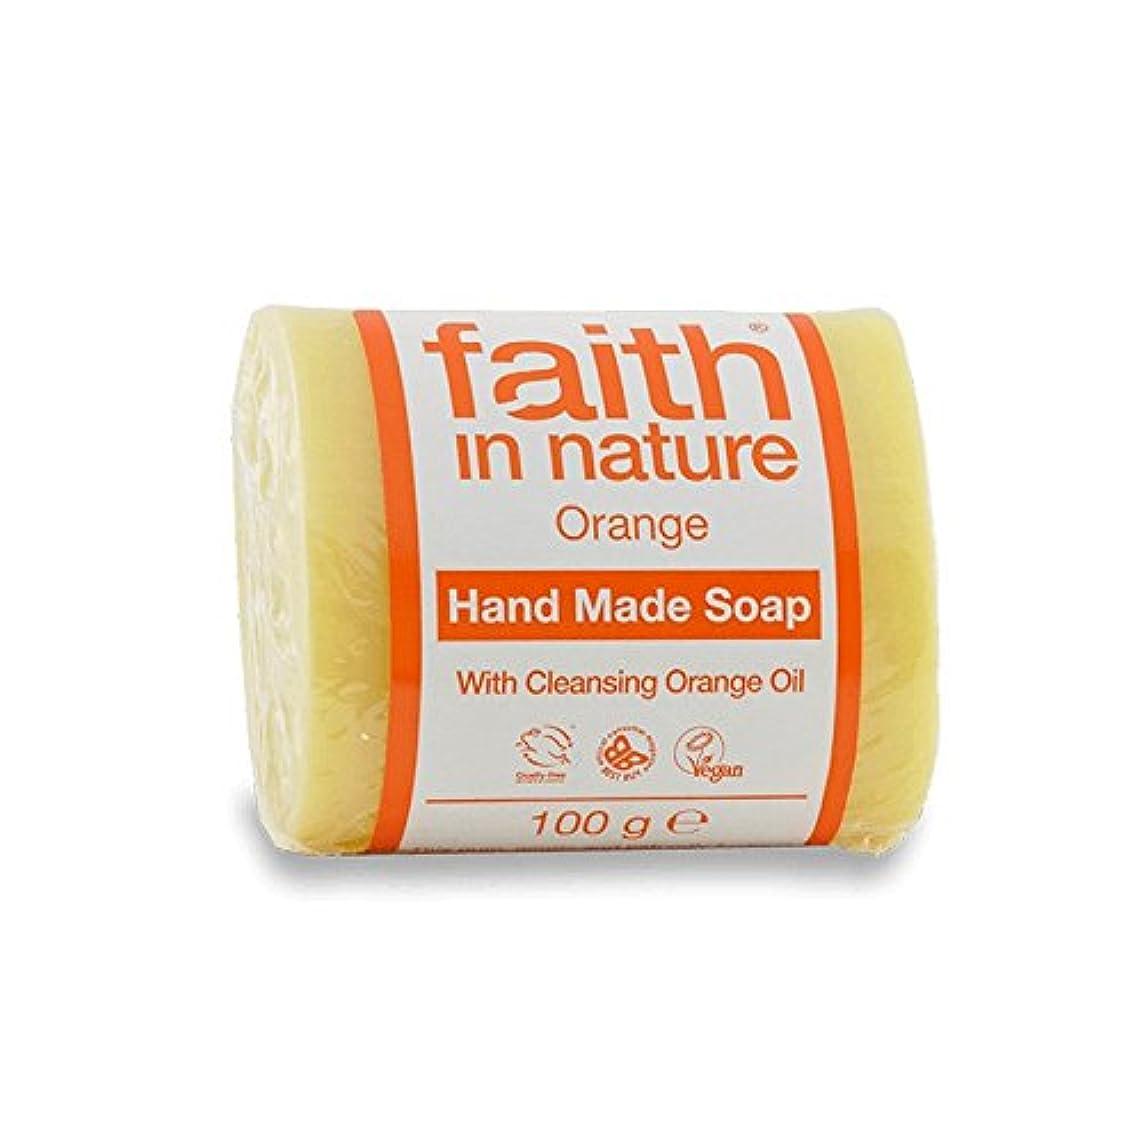 Faith in Nature Orange Soap 100g (Pack of 2) - 自然オレンジ色の石鹸100グラムの信仰 (x2) [並行輸入品]